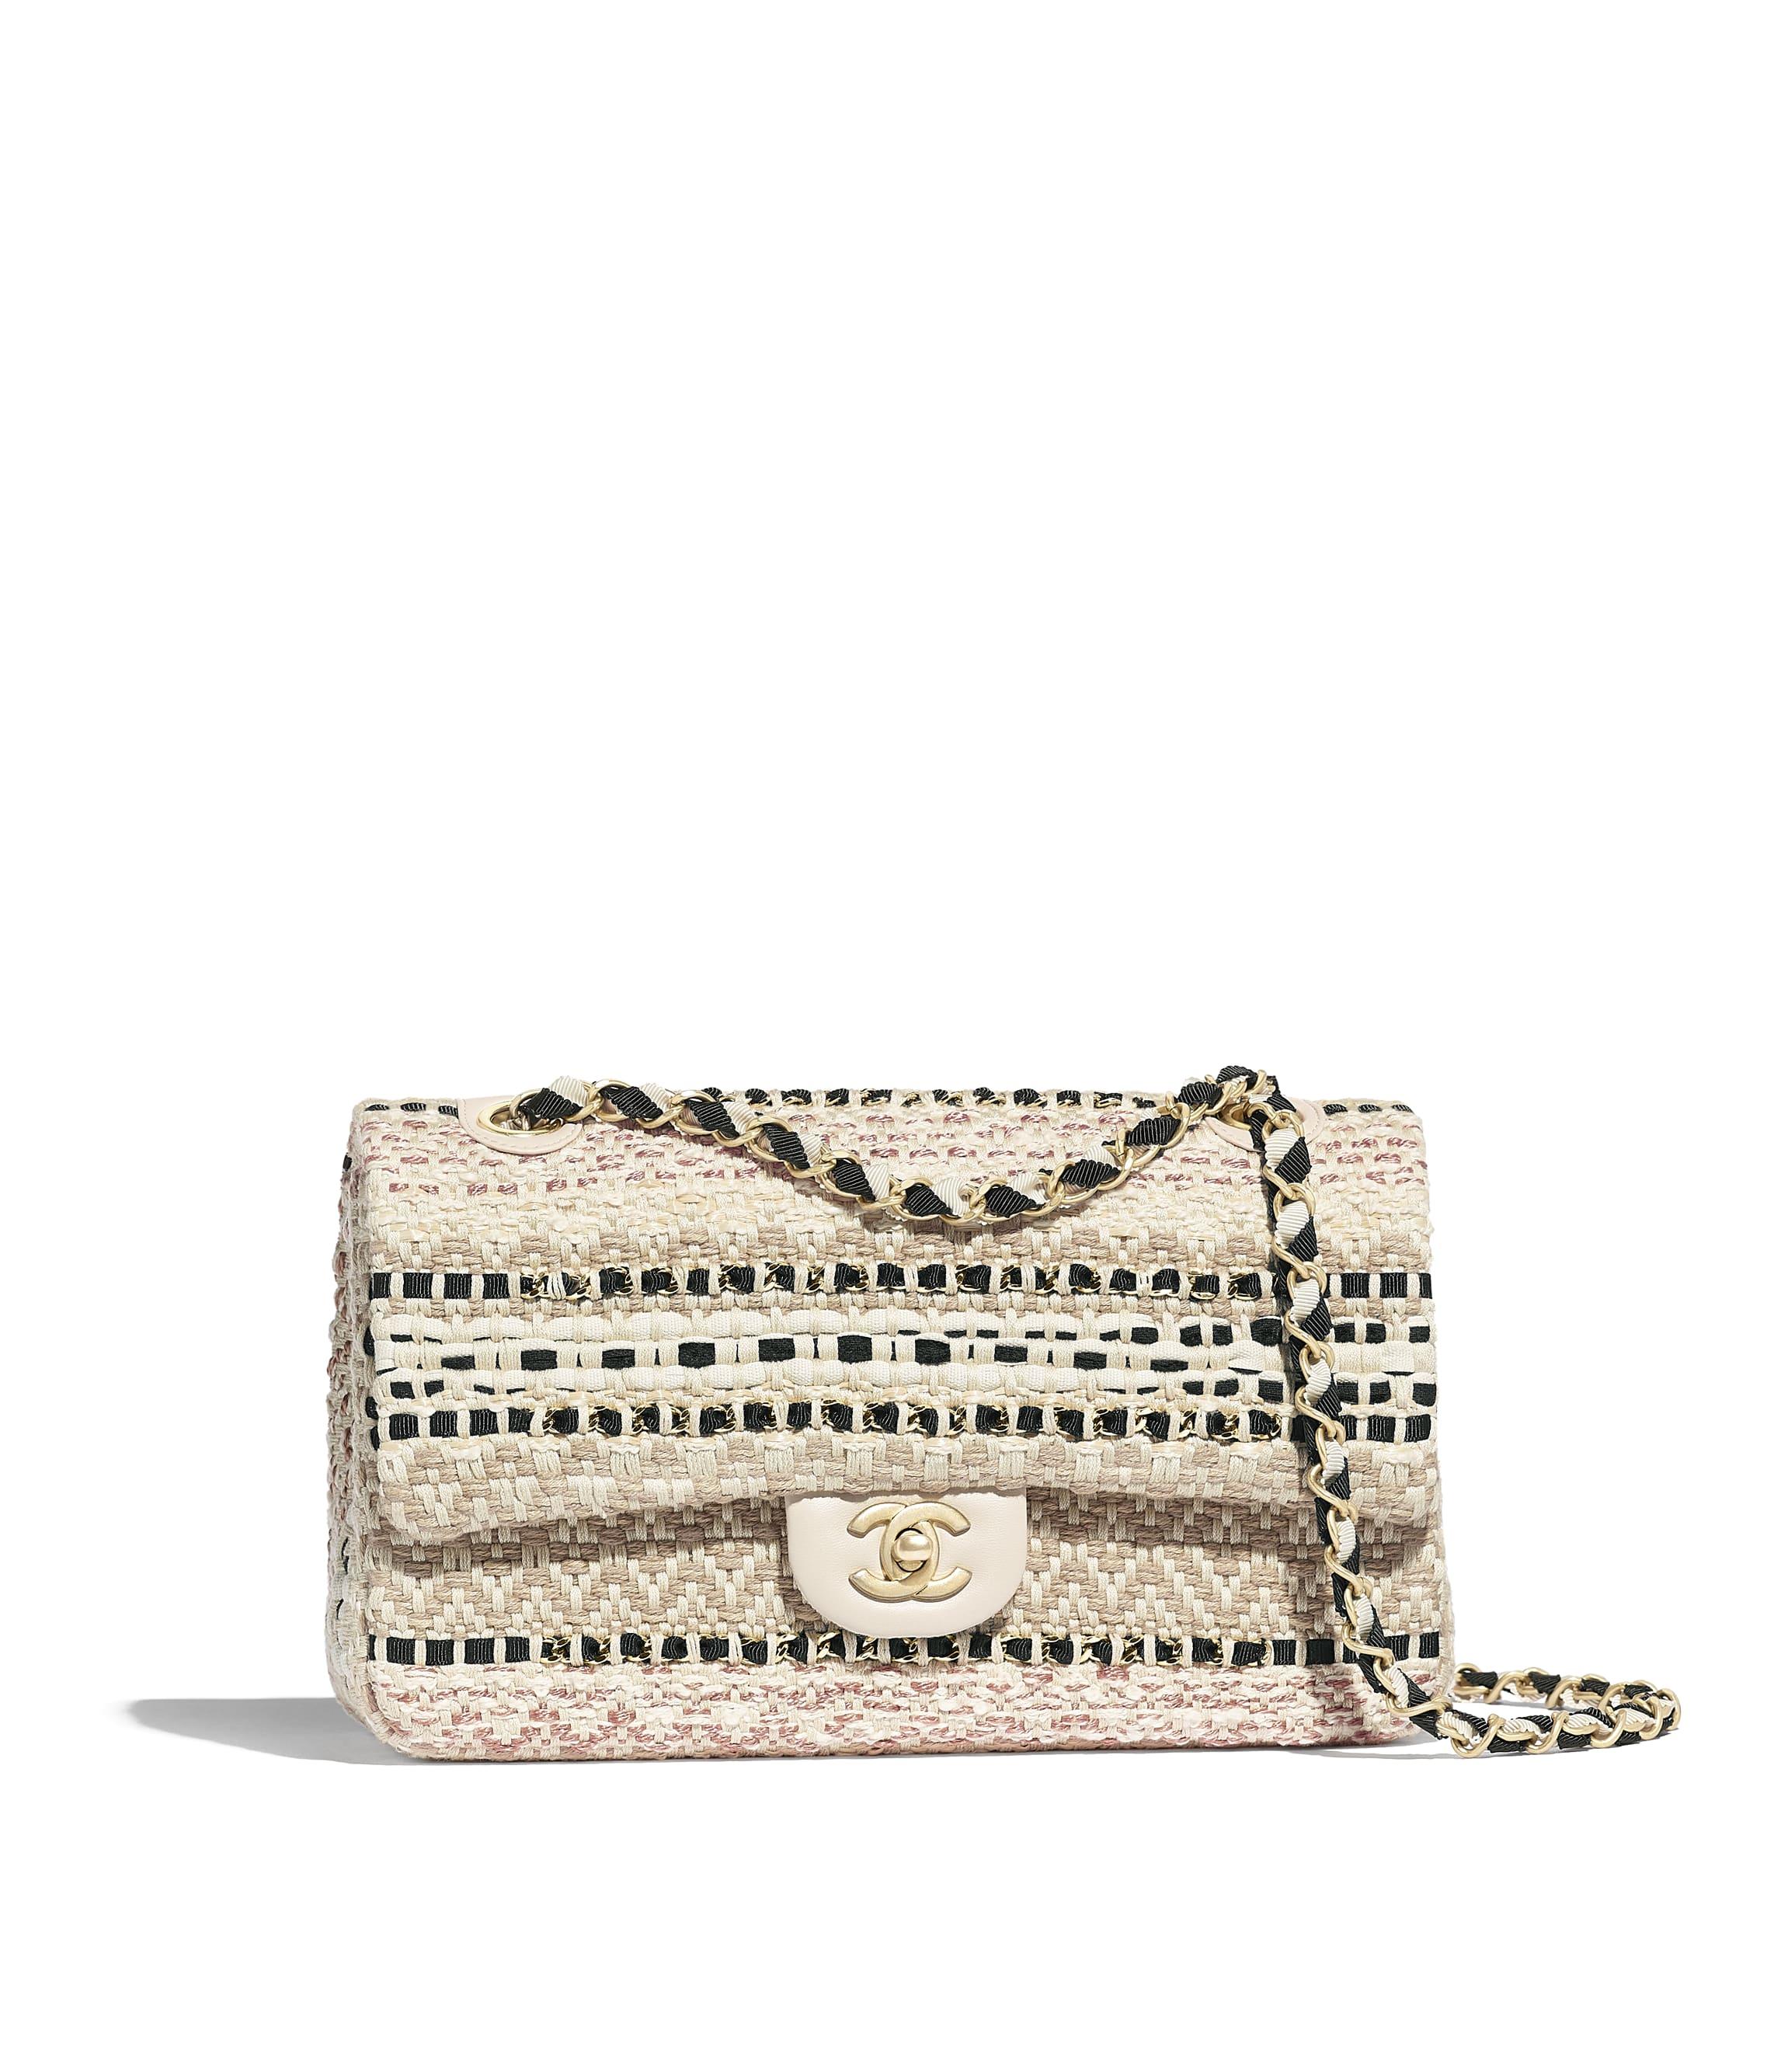 64993d3e57291d Flap Bag, cotton, raffia, lambskin & gold-tone metal, beige & black ...